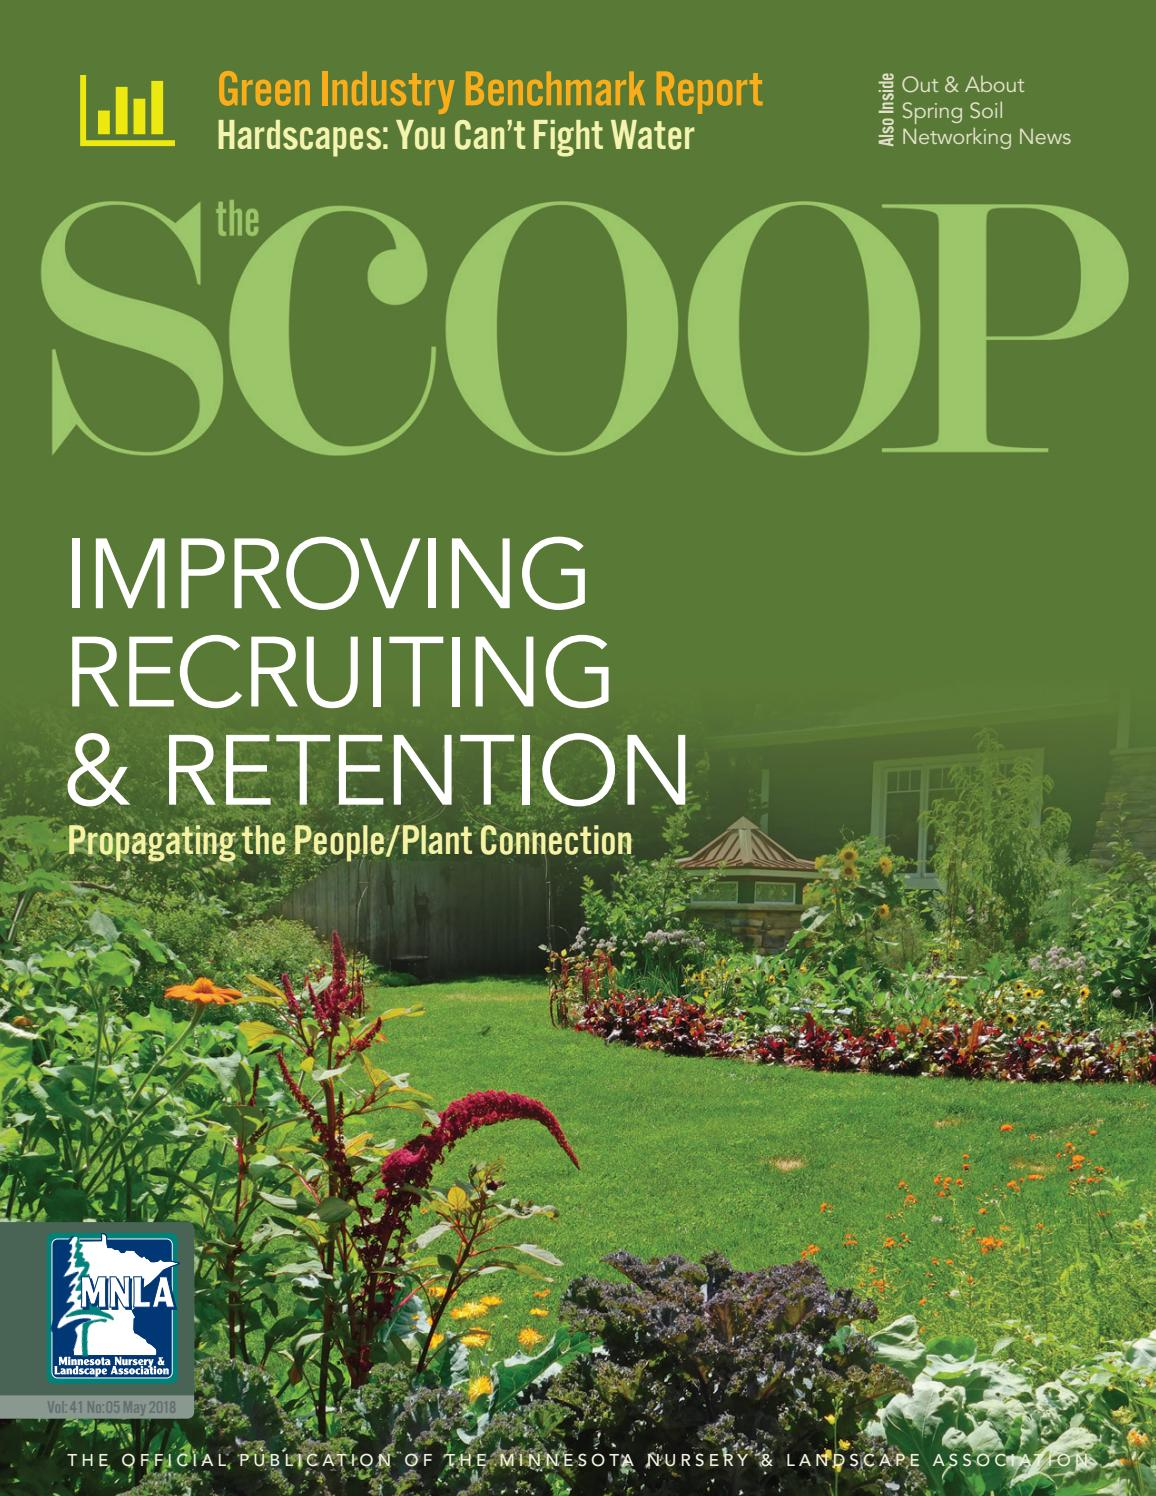 The Scoop Online May 2018 By Minnesota Nursery Landscape